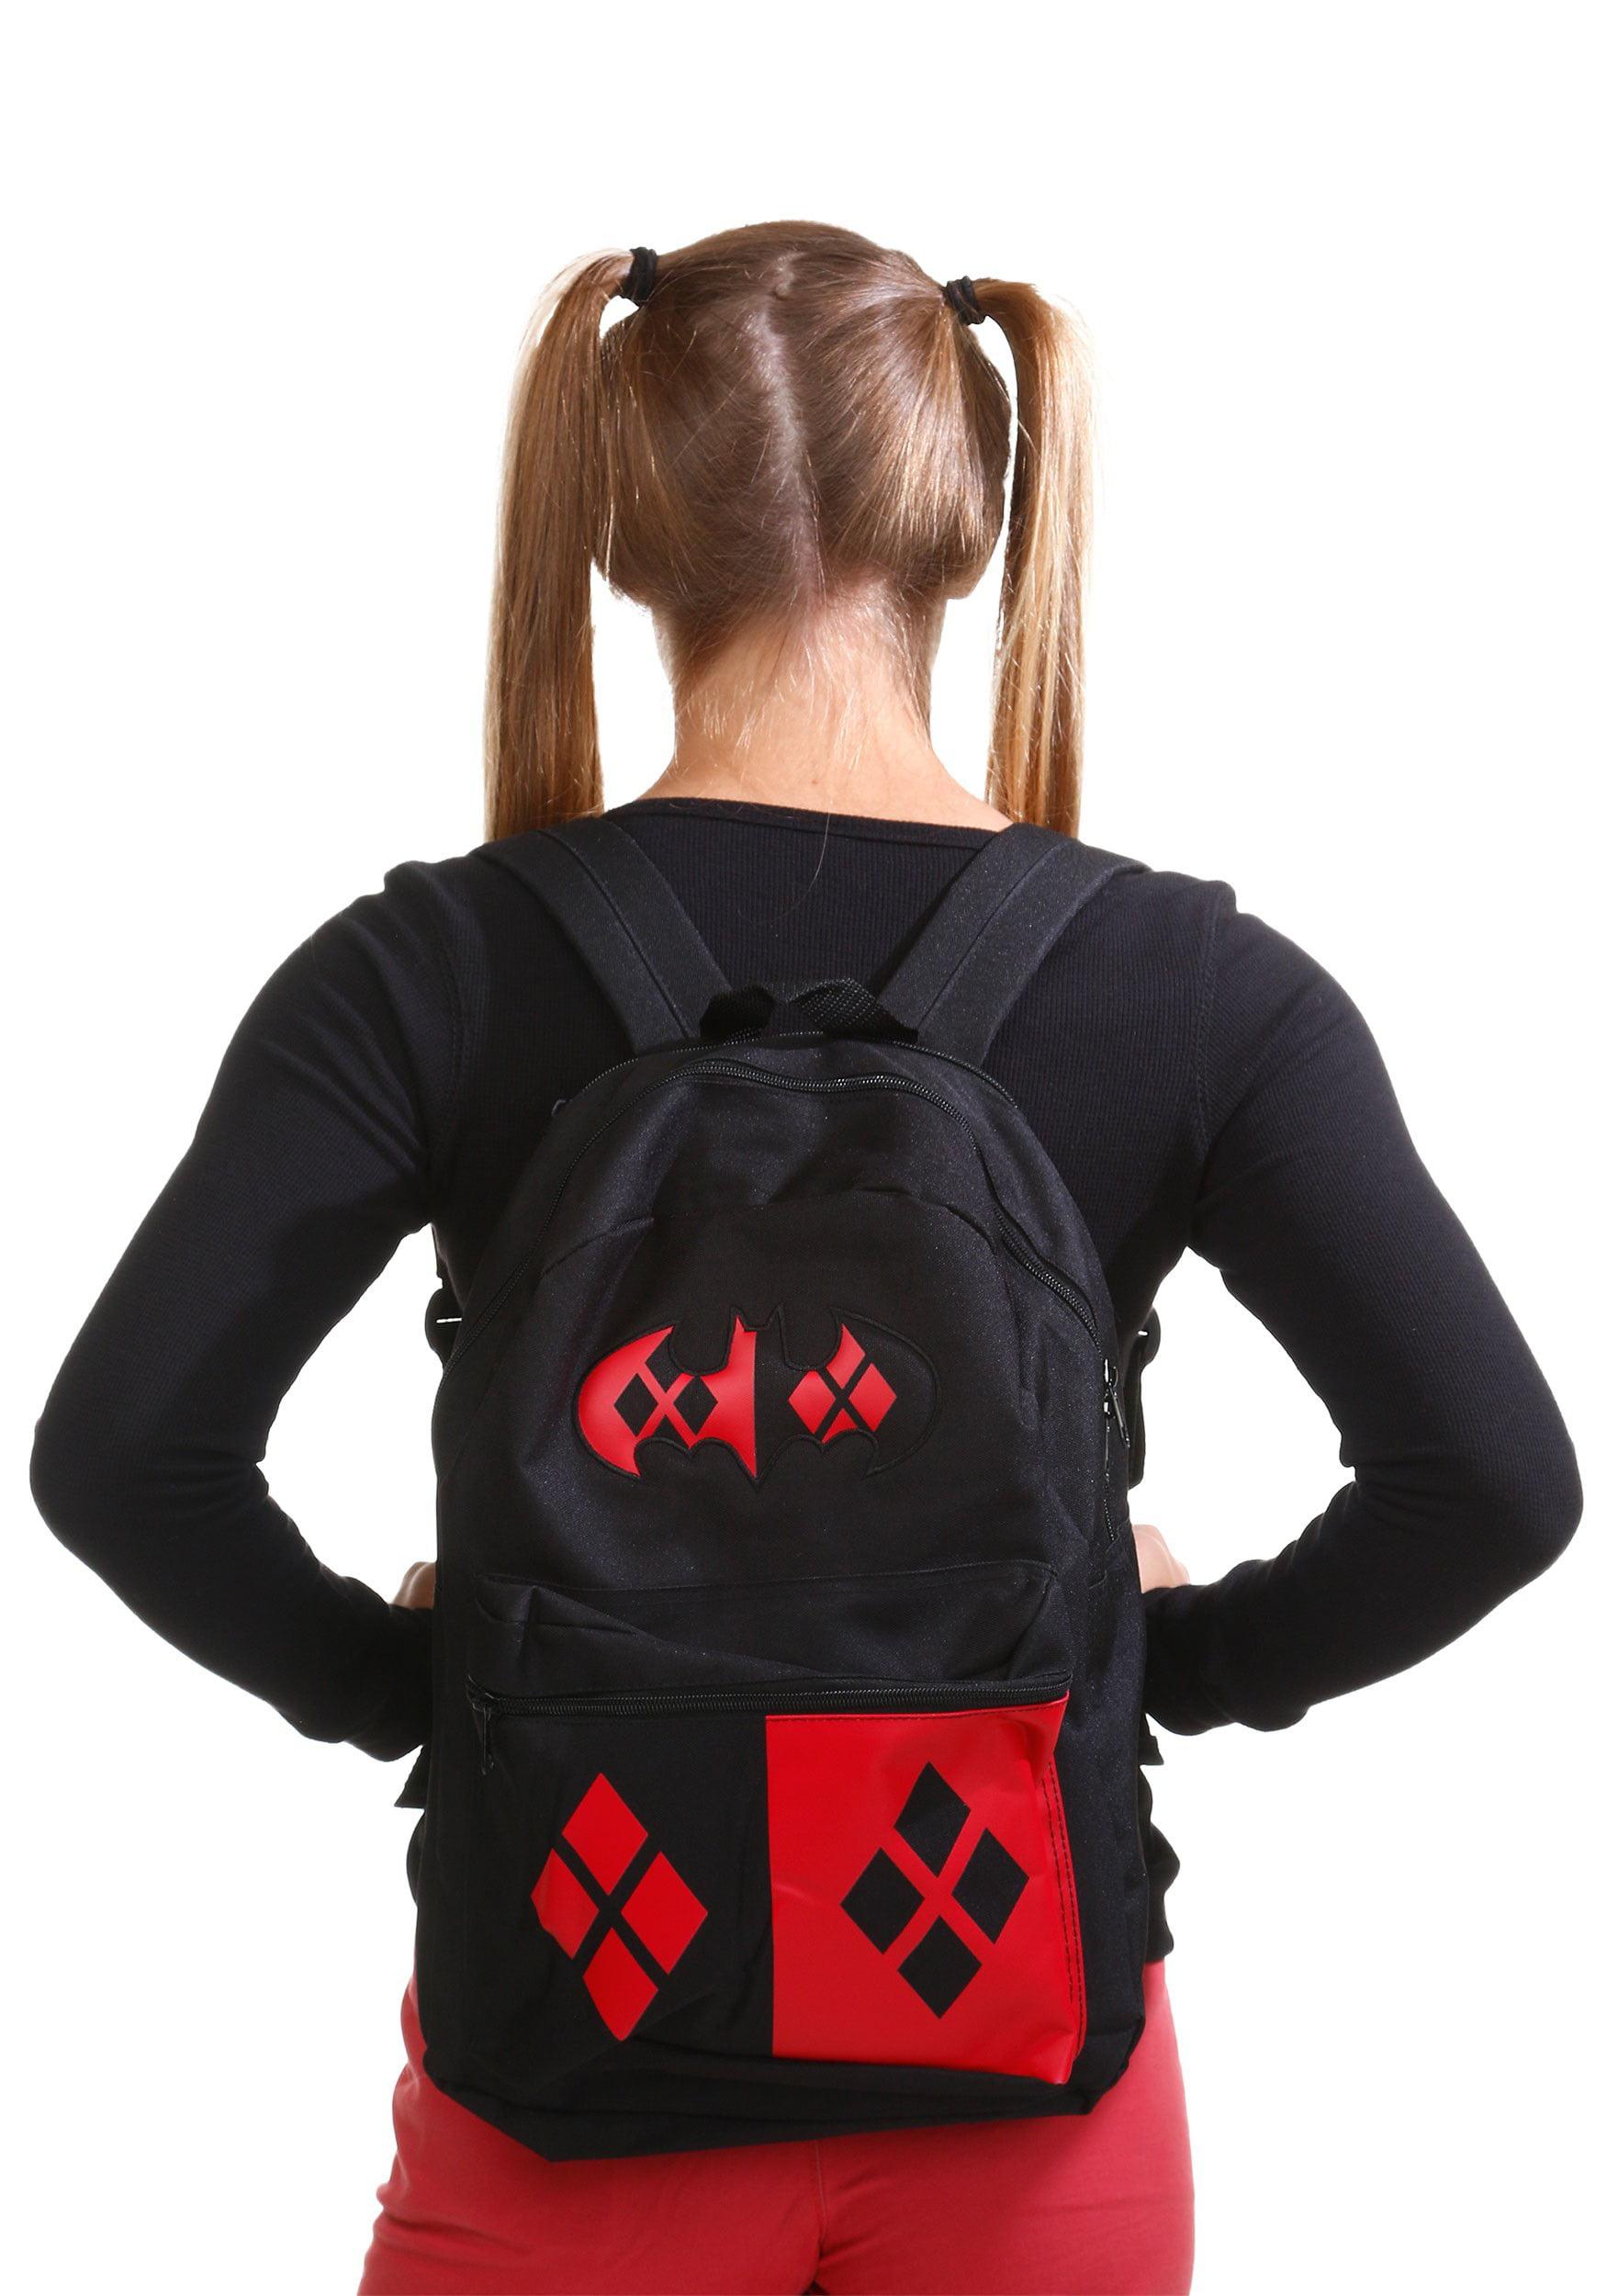 8d2f7a2f4ee Harley quinn hood backpack jpg 1750x2500 Harley quinn book bag